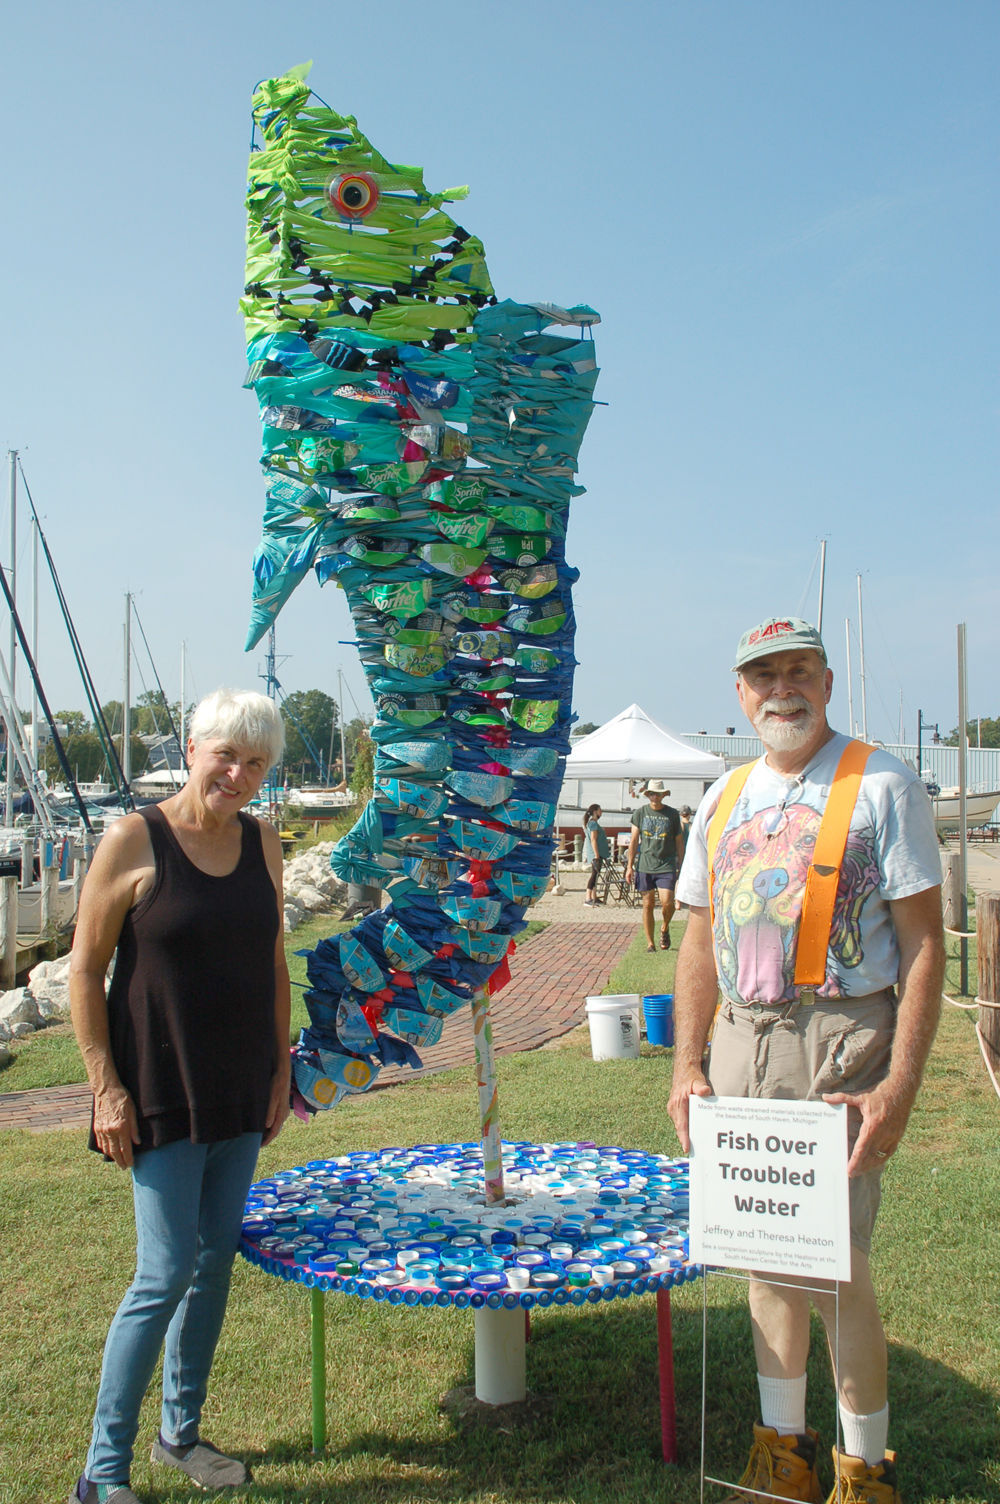 Make a splash artists with sculpture